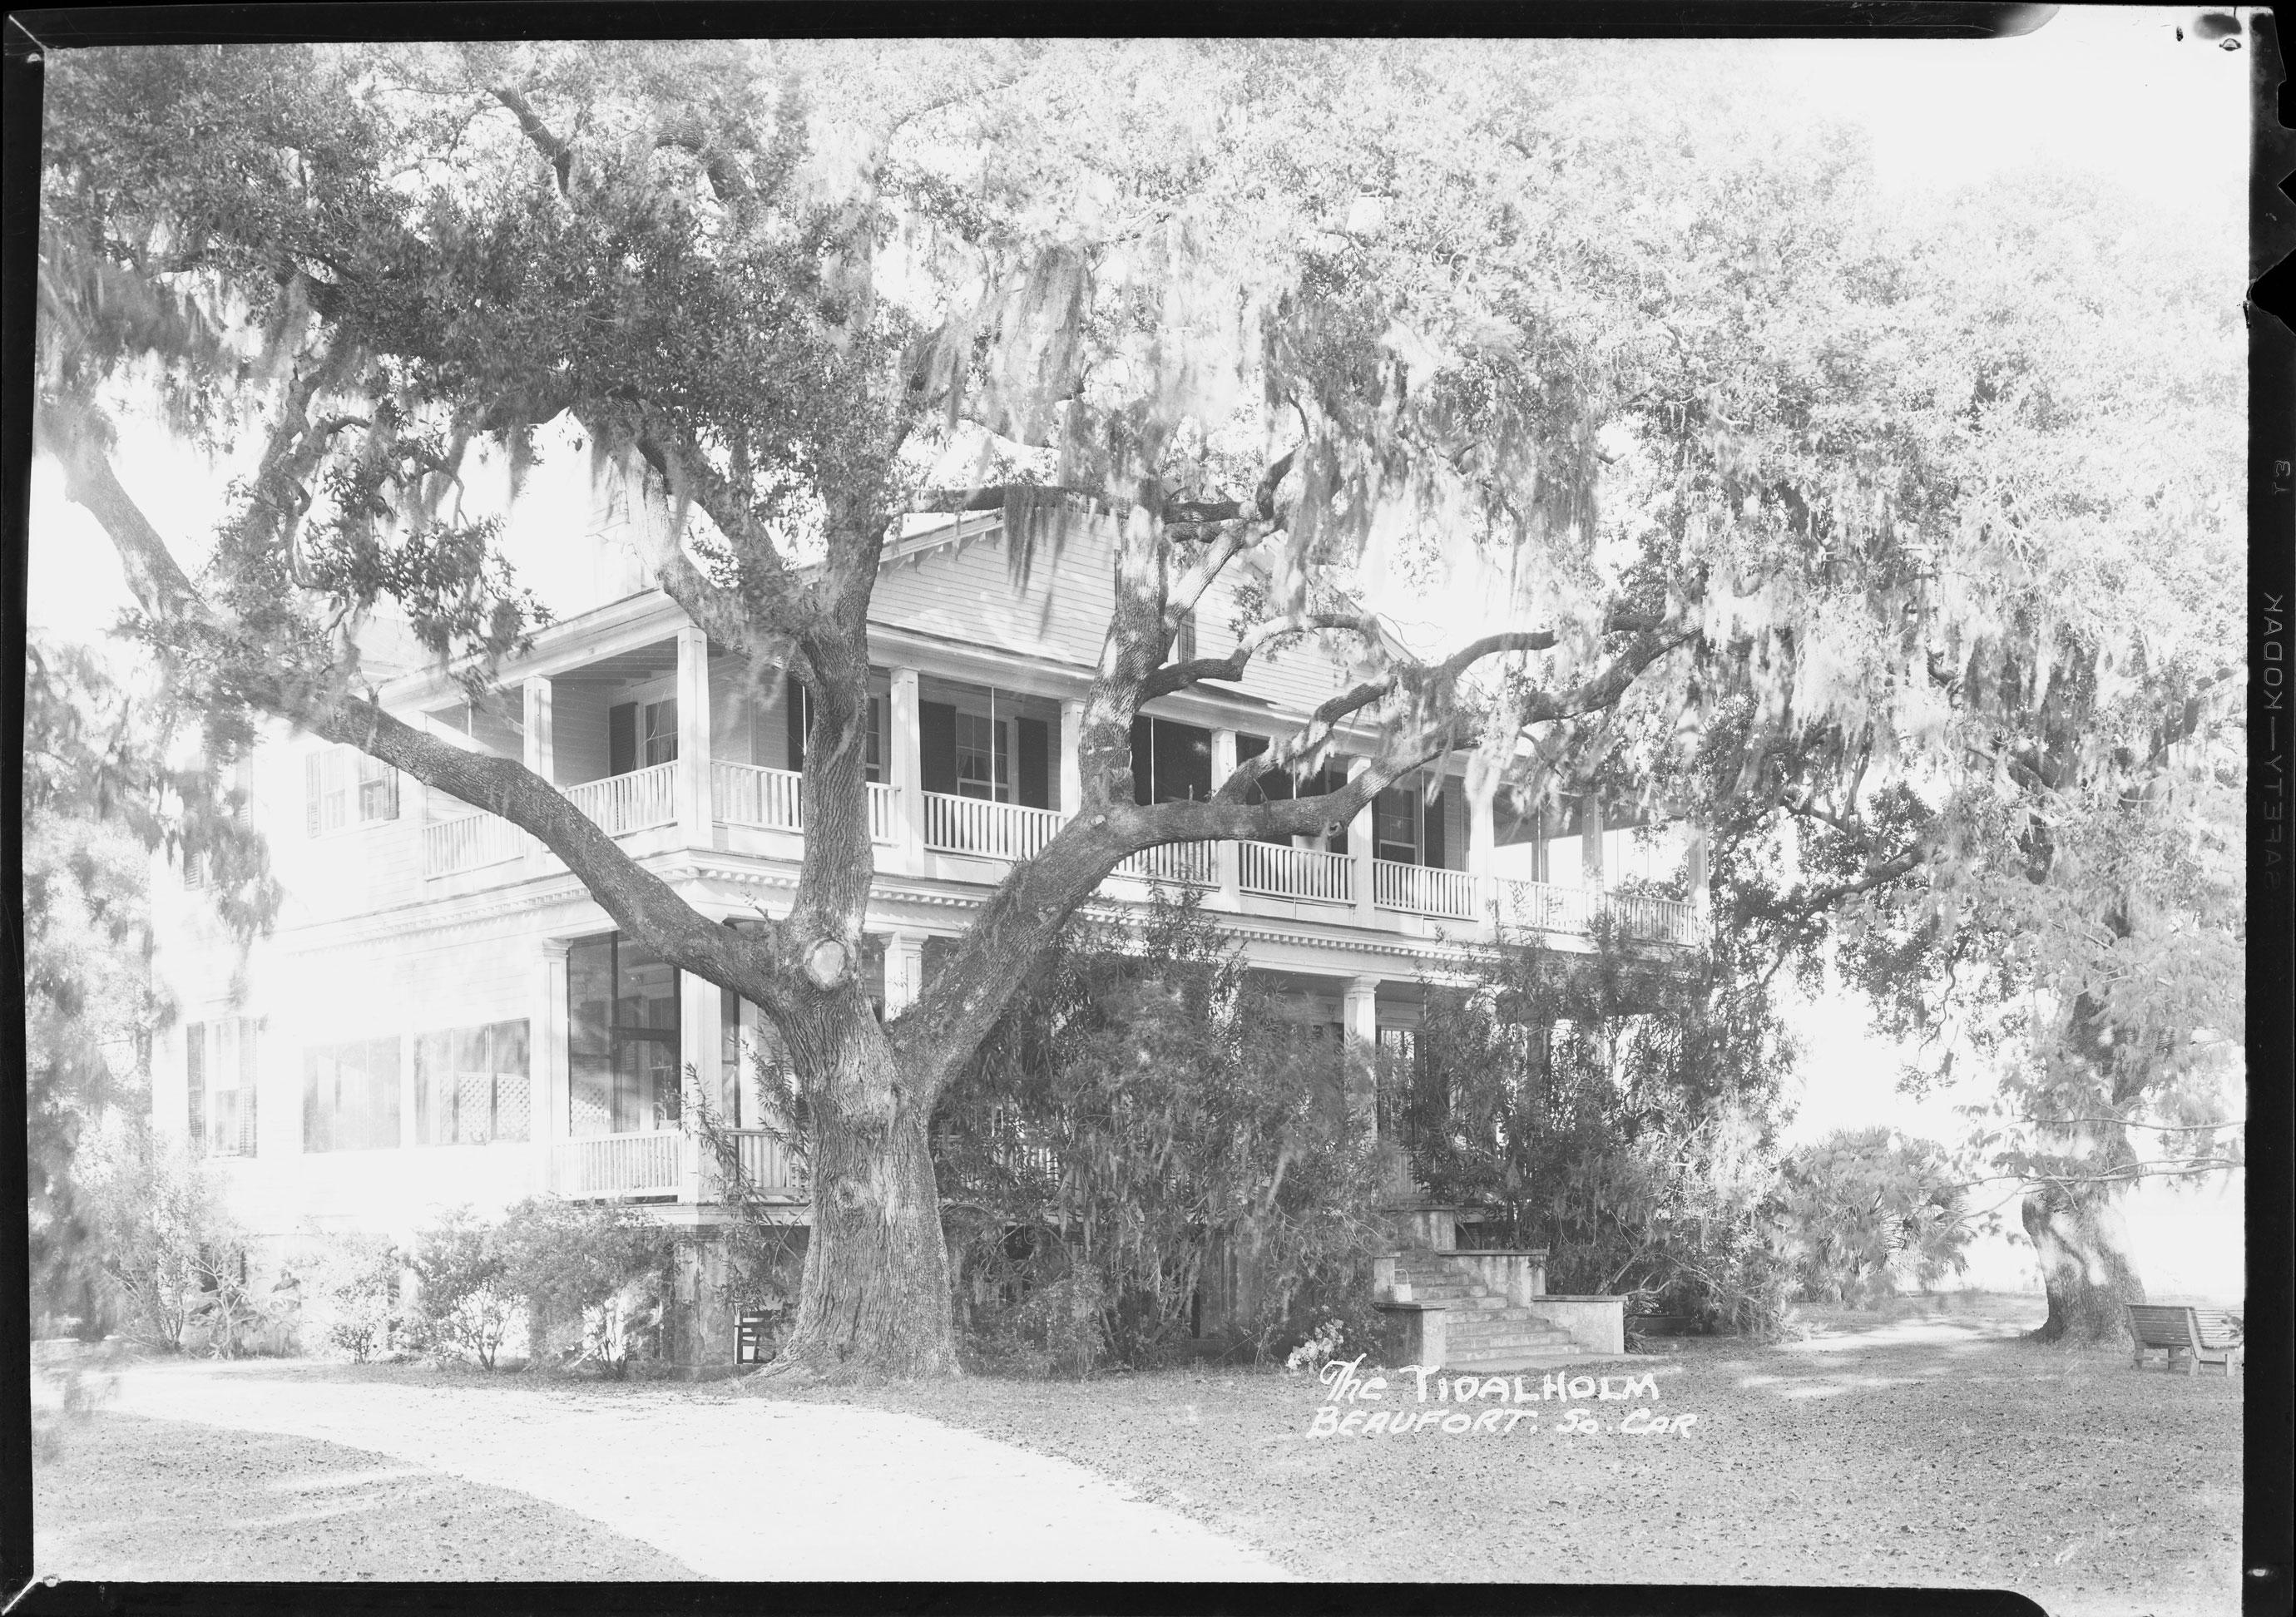 The Tidalholm Beaufort, S.C.